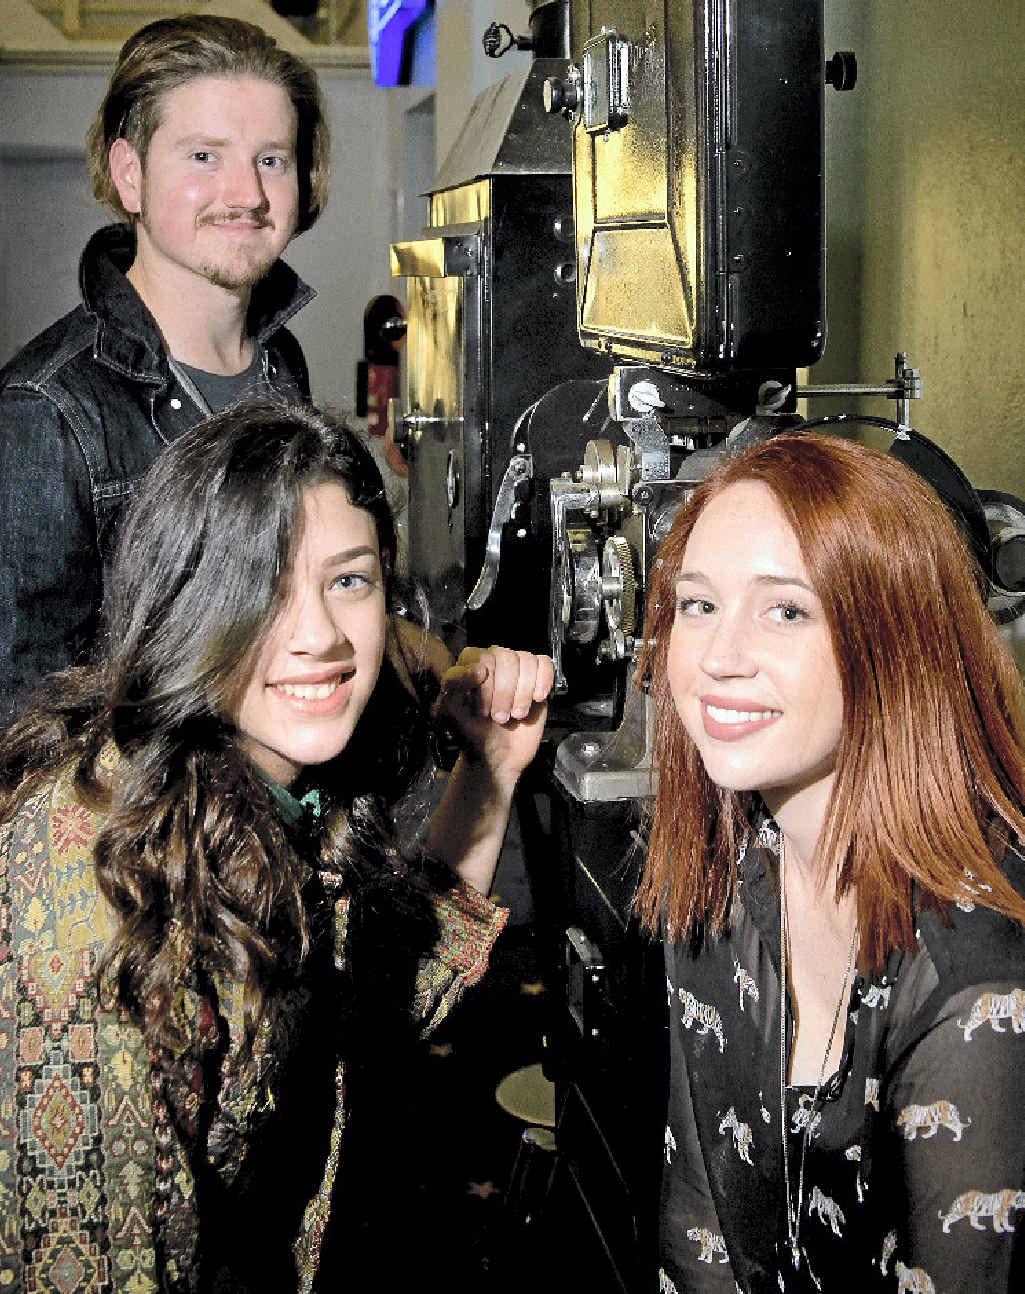 CINEPHILES: Toowoomba Film Society members (from left) Stephen Payton, Chloe Dalamaras and Ally Beckman.